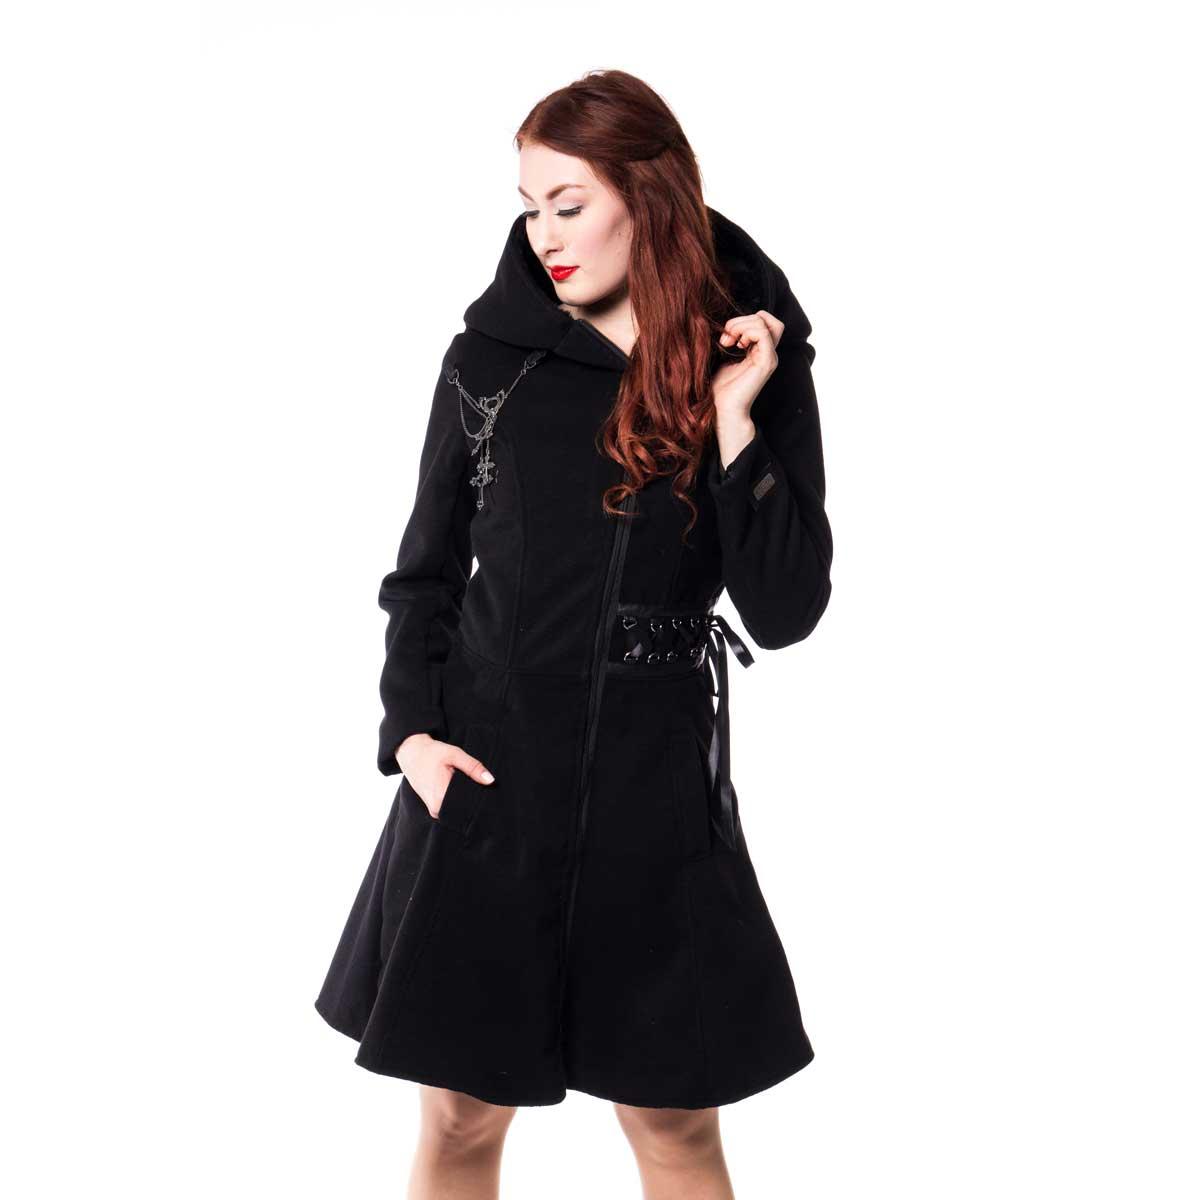 wintermantel mit grosser kapuze schn rung tears coat. Black Bedroom Furniture Sets. Home Design Ideas